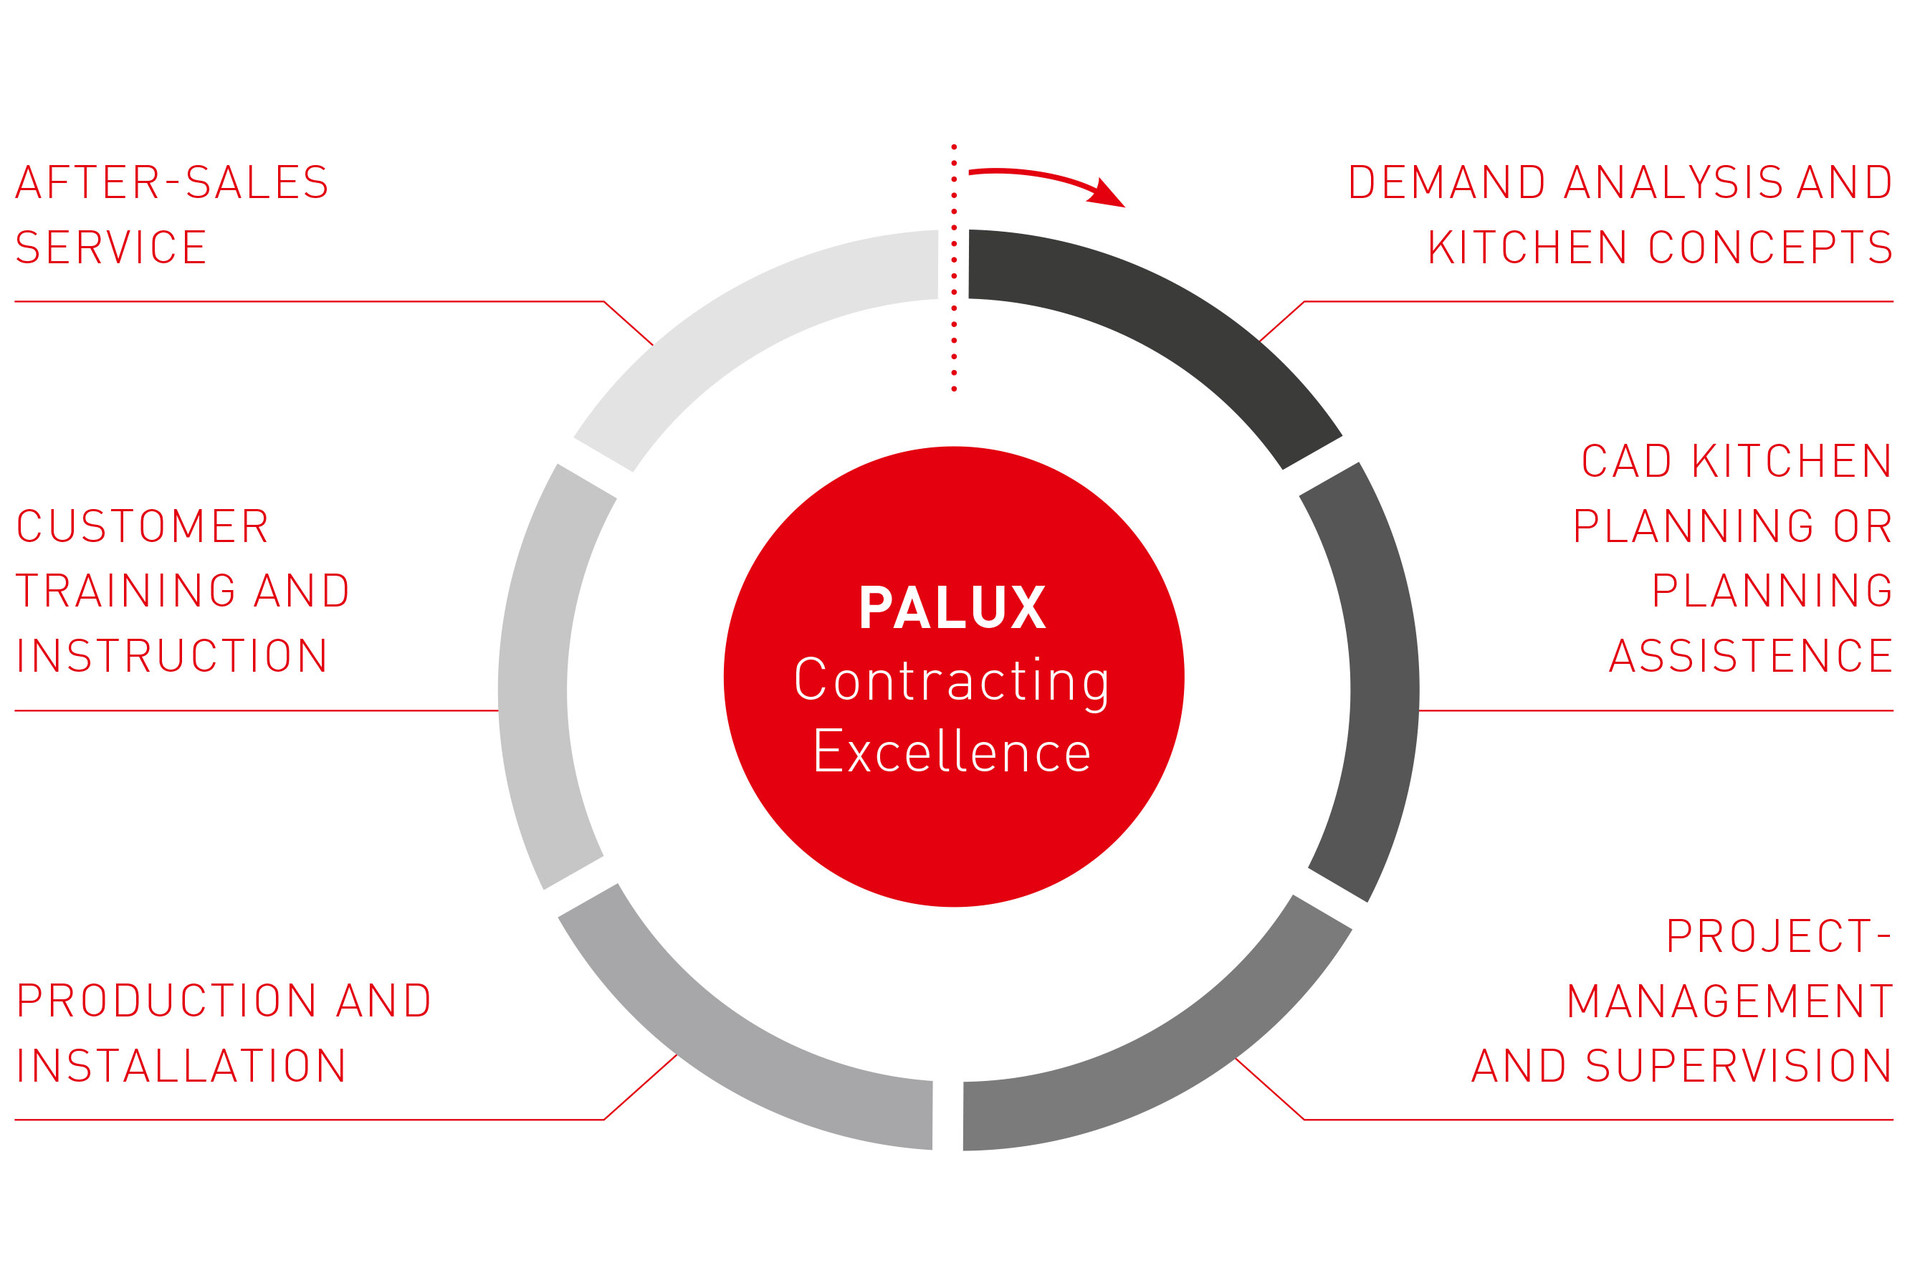 palux contracting excellence diagram en